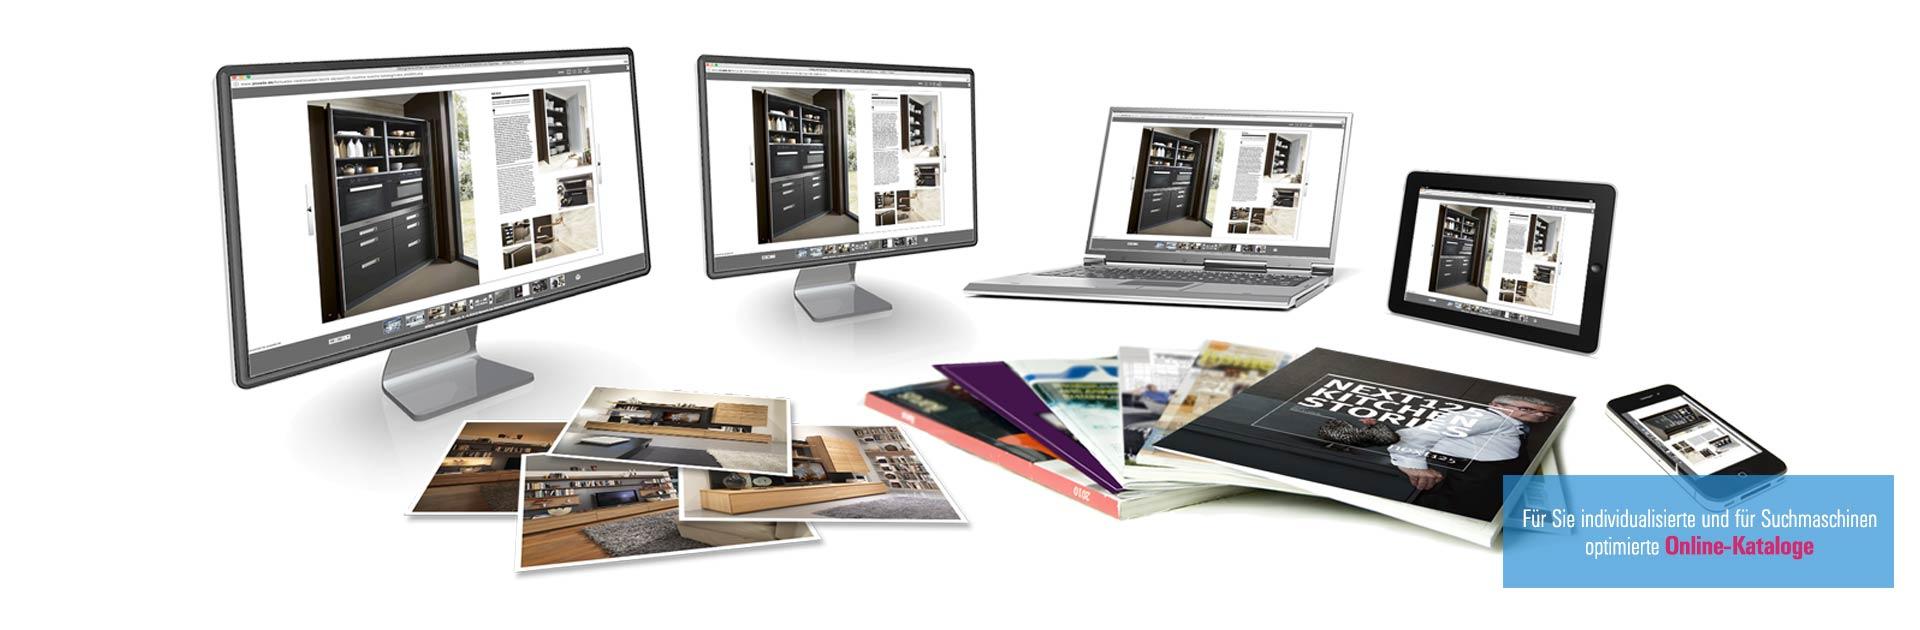 romanek mediamodule online kataloge und sortiment module in m nchen nahe. Black Bedroom Furniture Sets. Home Design Ideas